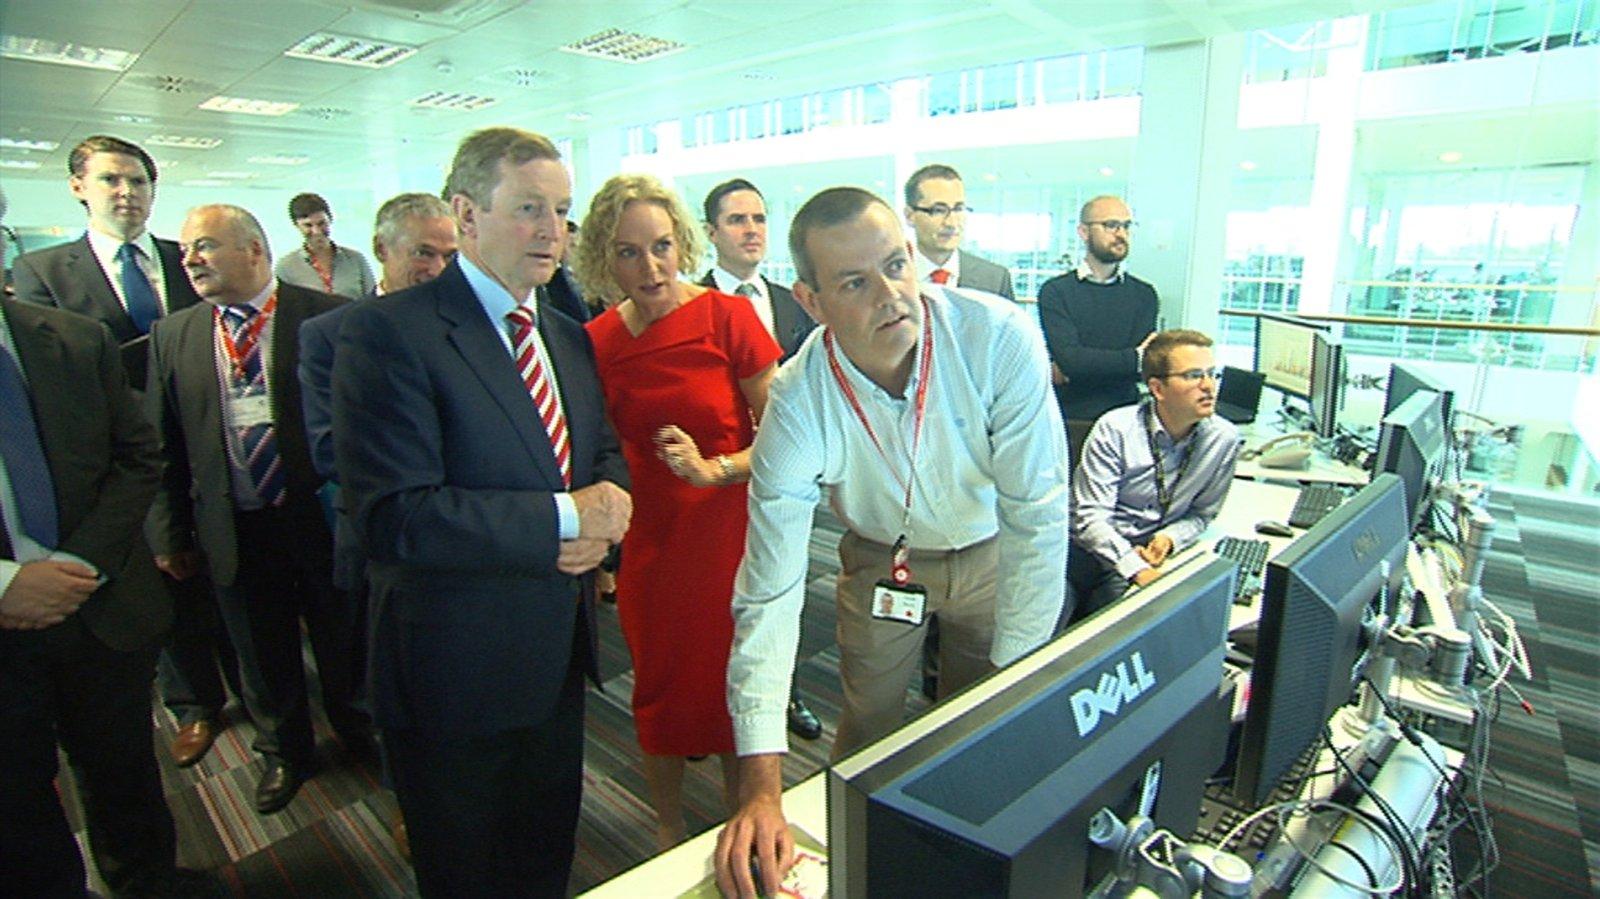 Vodafone plans to create 200 jobs in Dublin